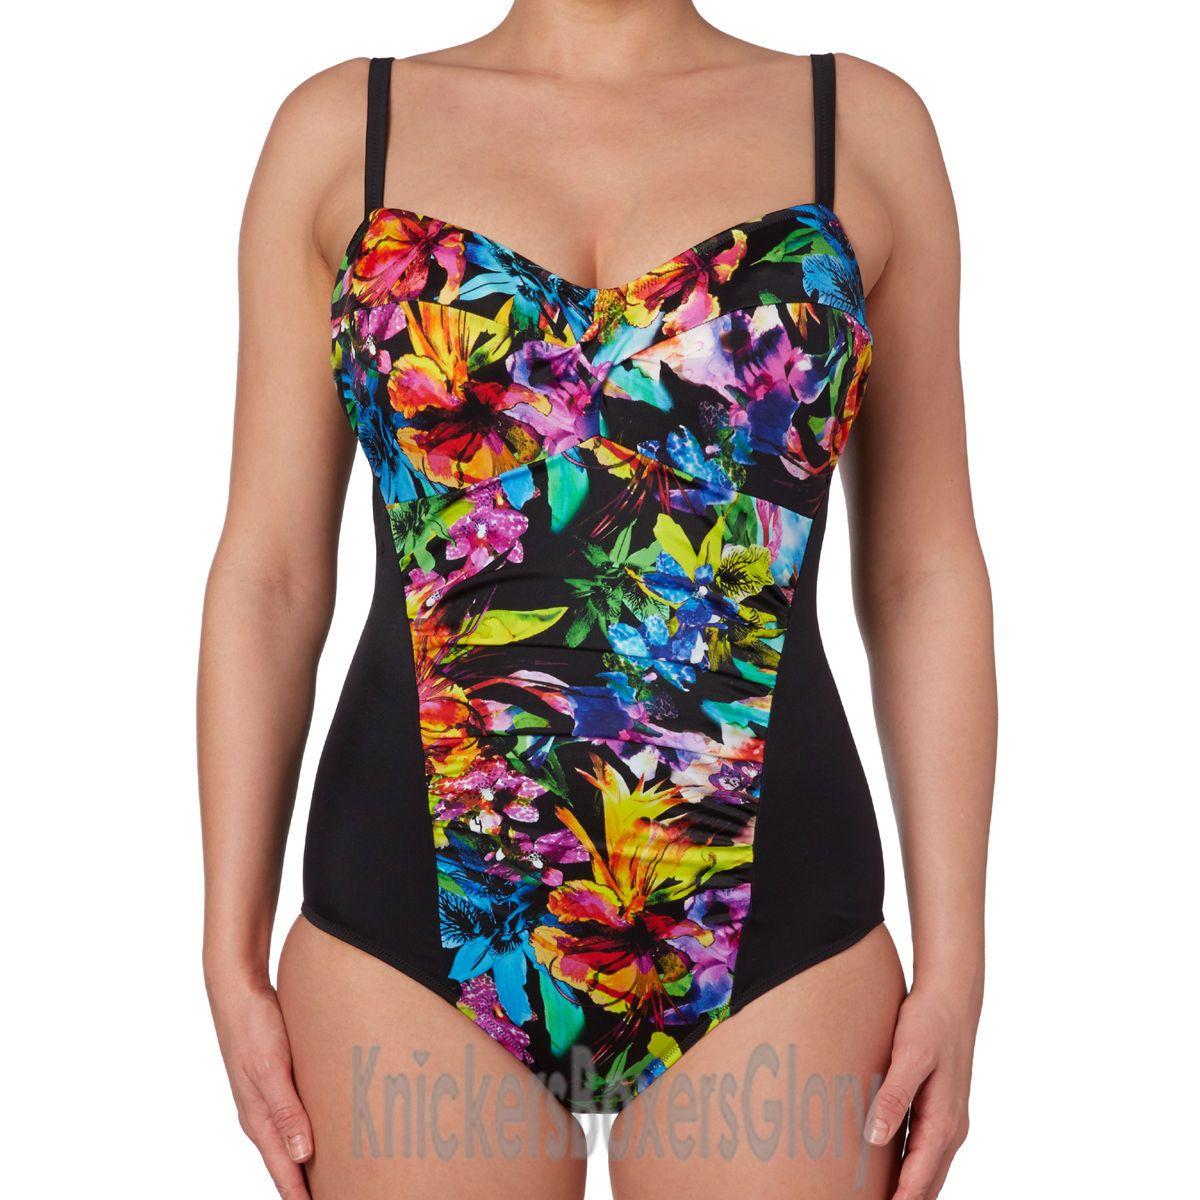 d4efe65de51 Fantasie Swimwear Santa Rosa Gathered Swimsuit Multi NEW 5454 Select ...